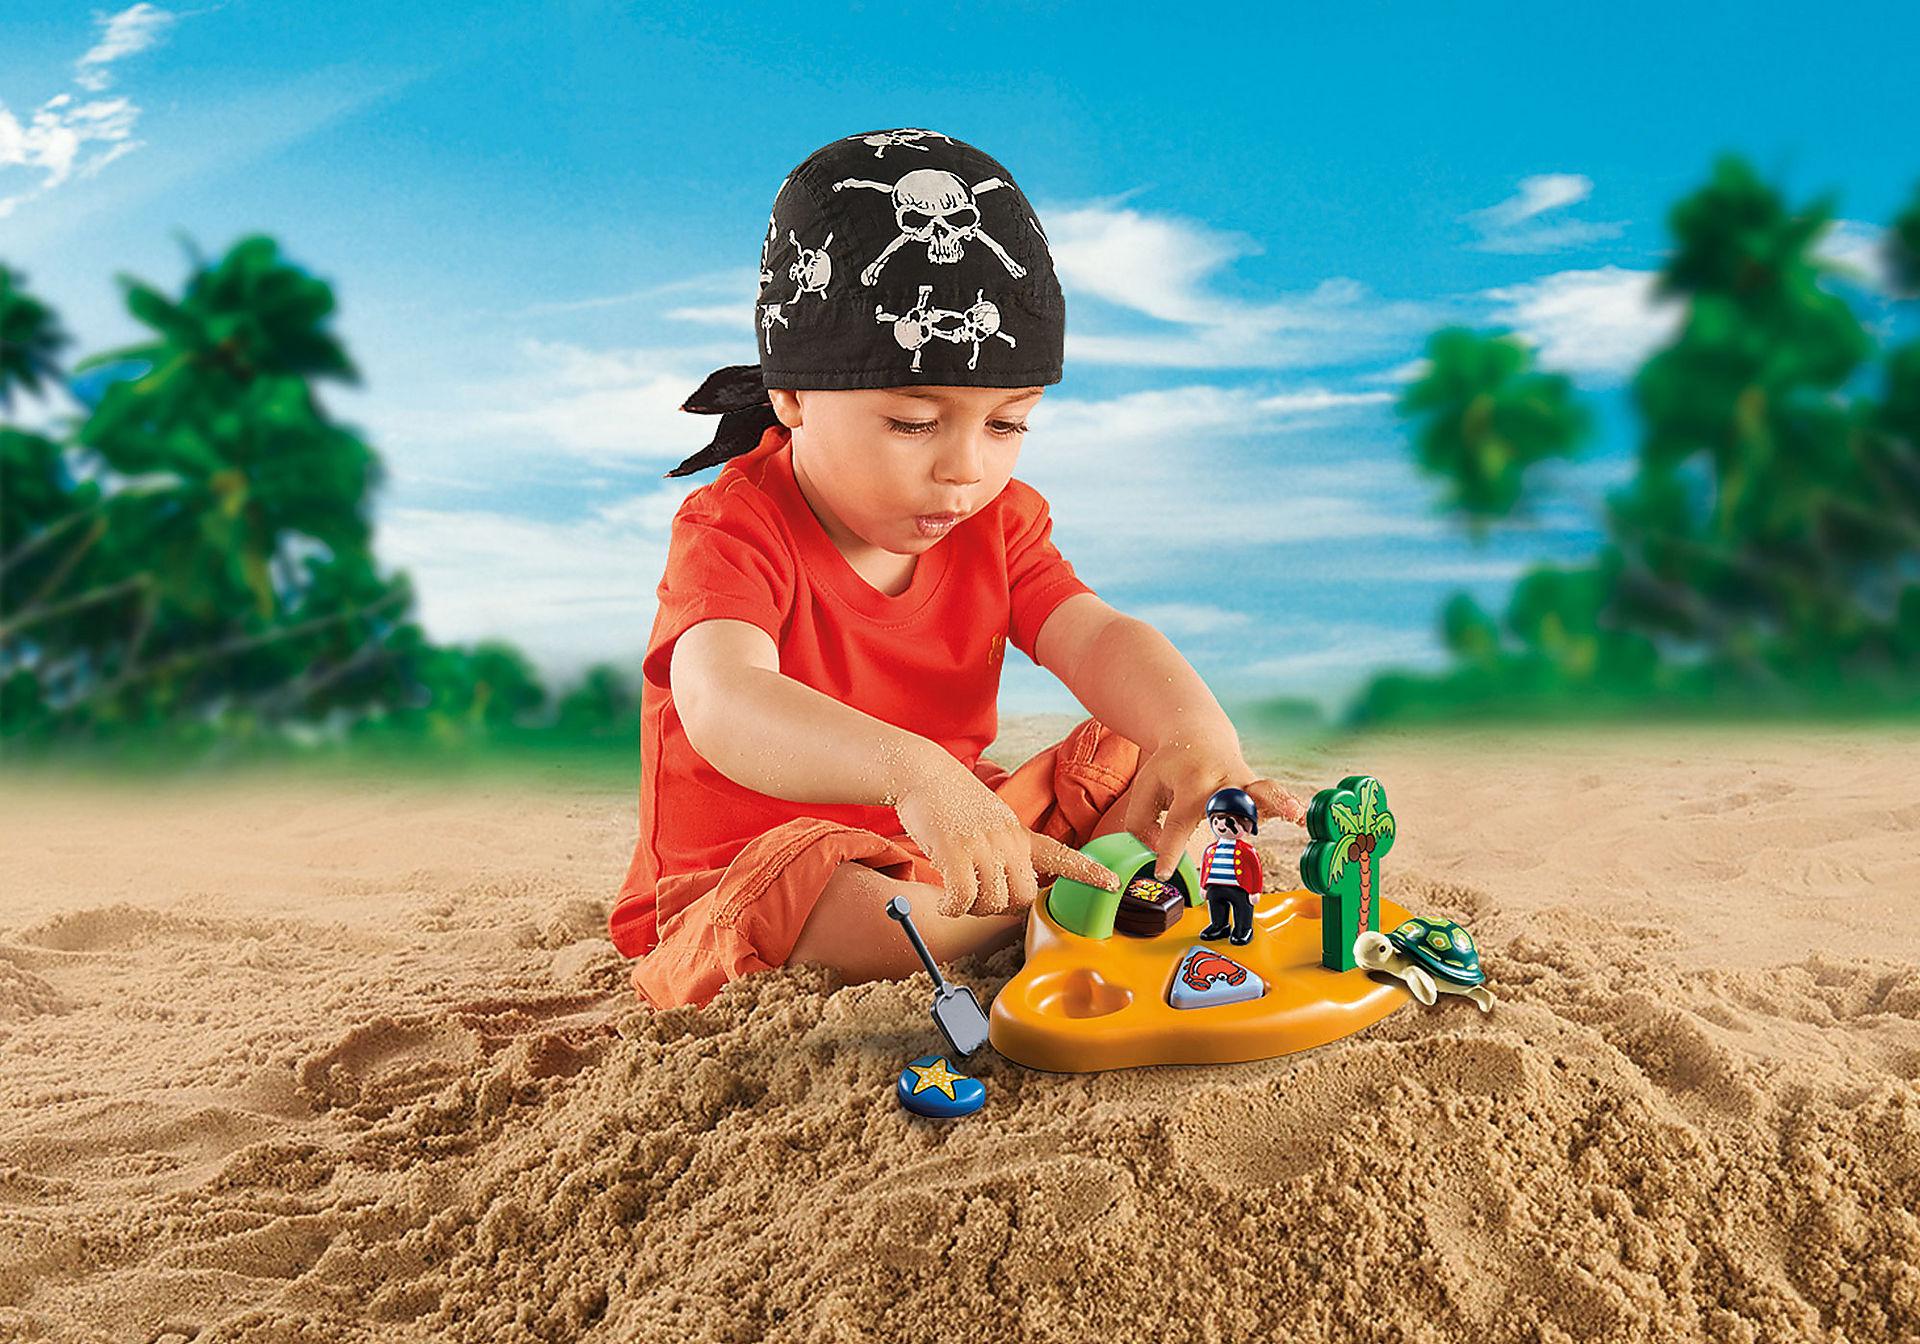 9119 Isola dei Pirati 1.2.3 zoom image5